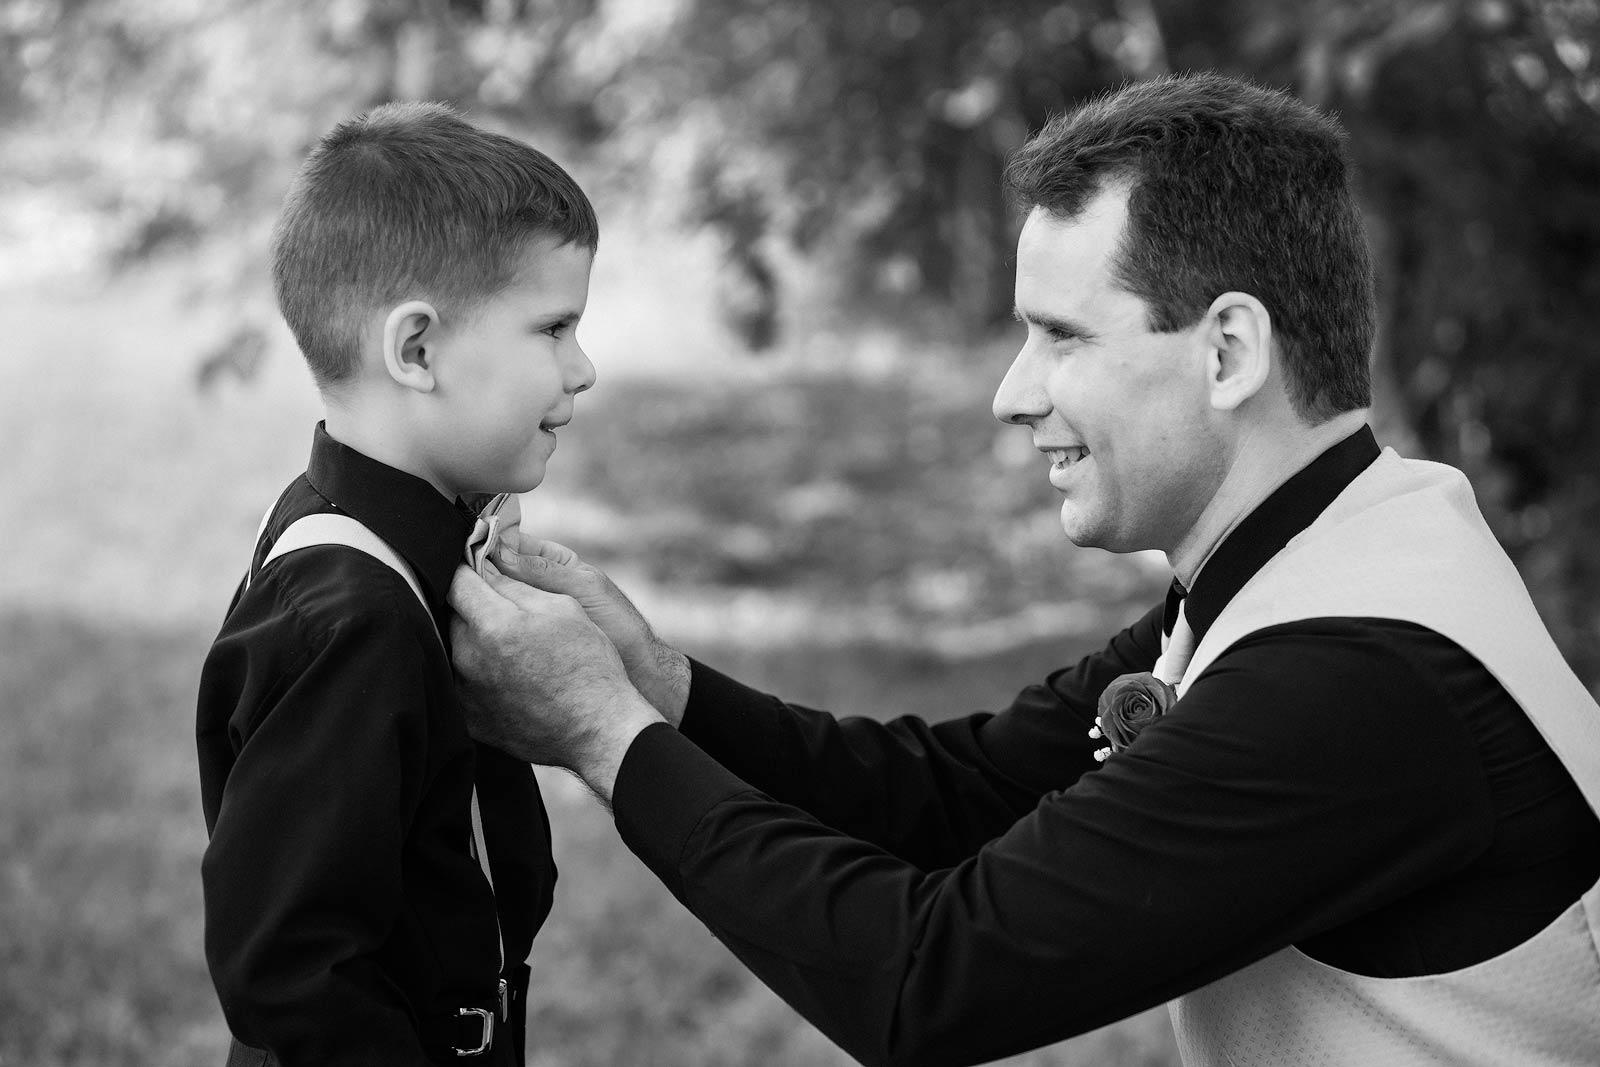 Wedding Photography - Father Helping Son Get Ready - Paul Dekort Photographer